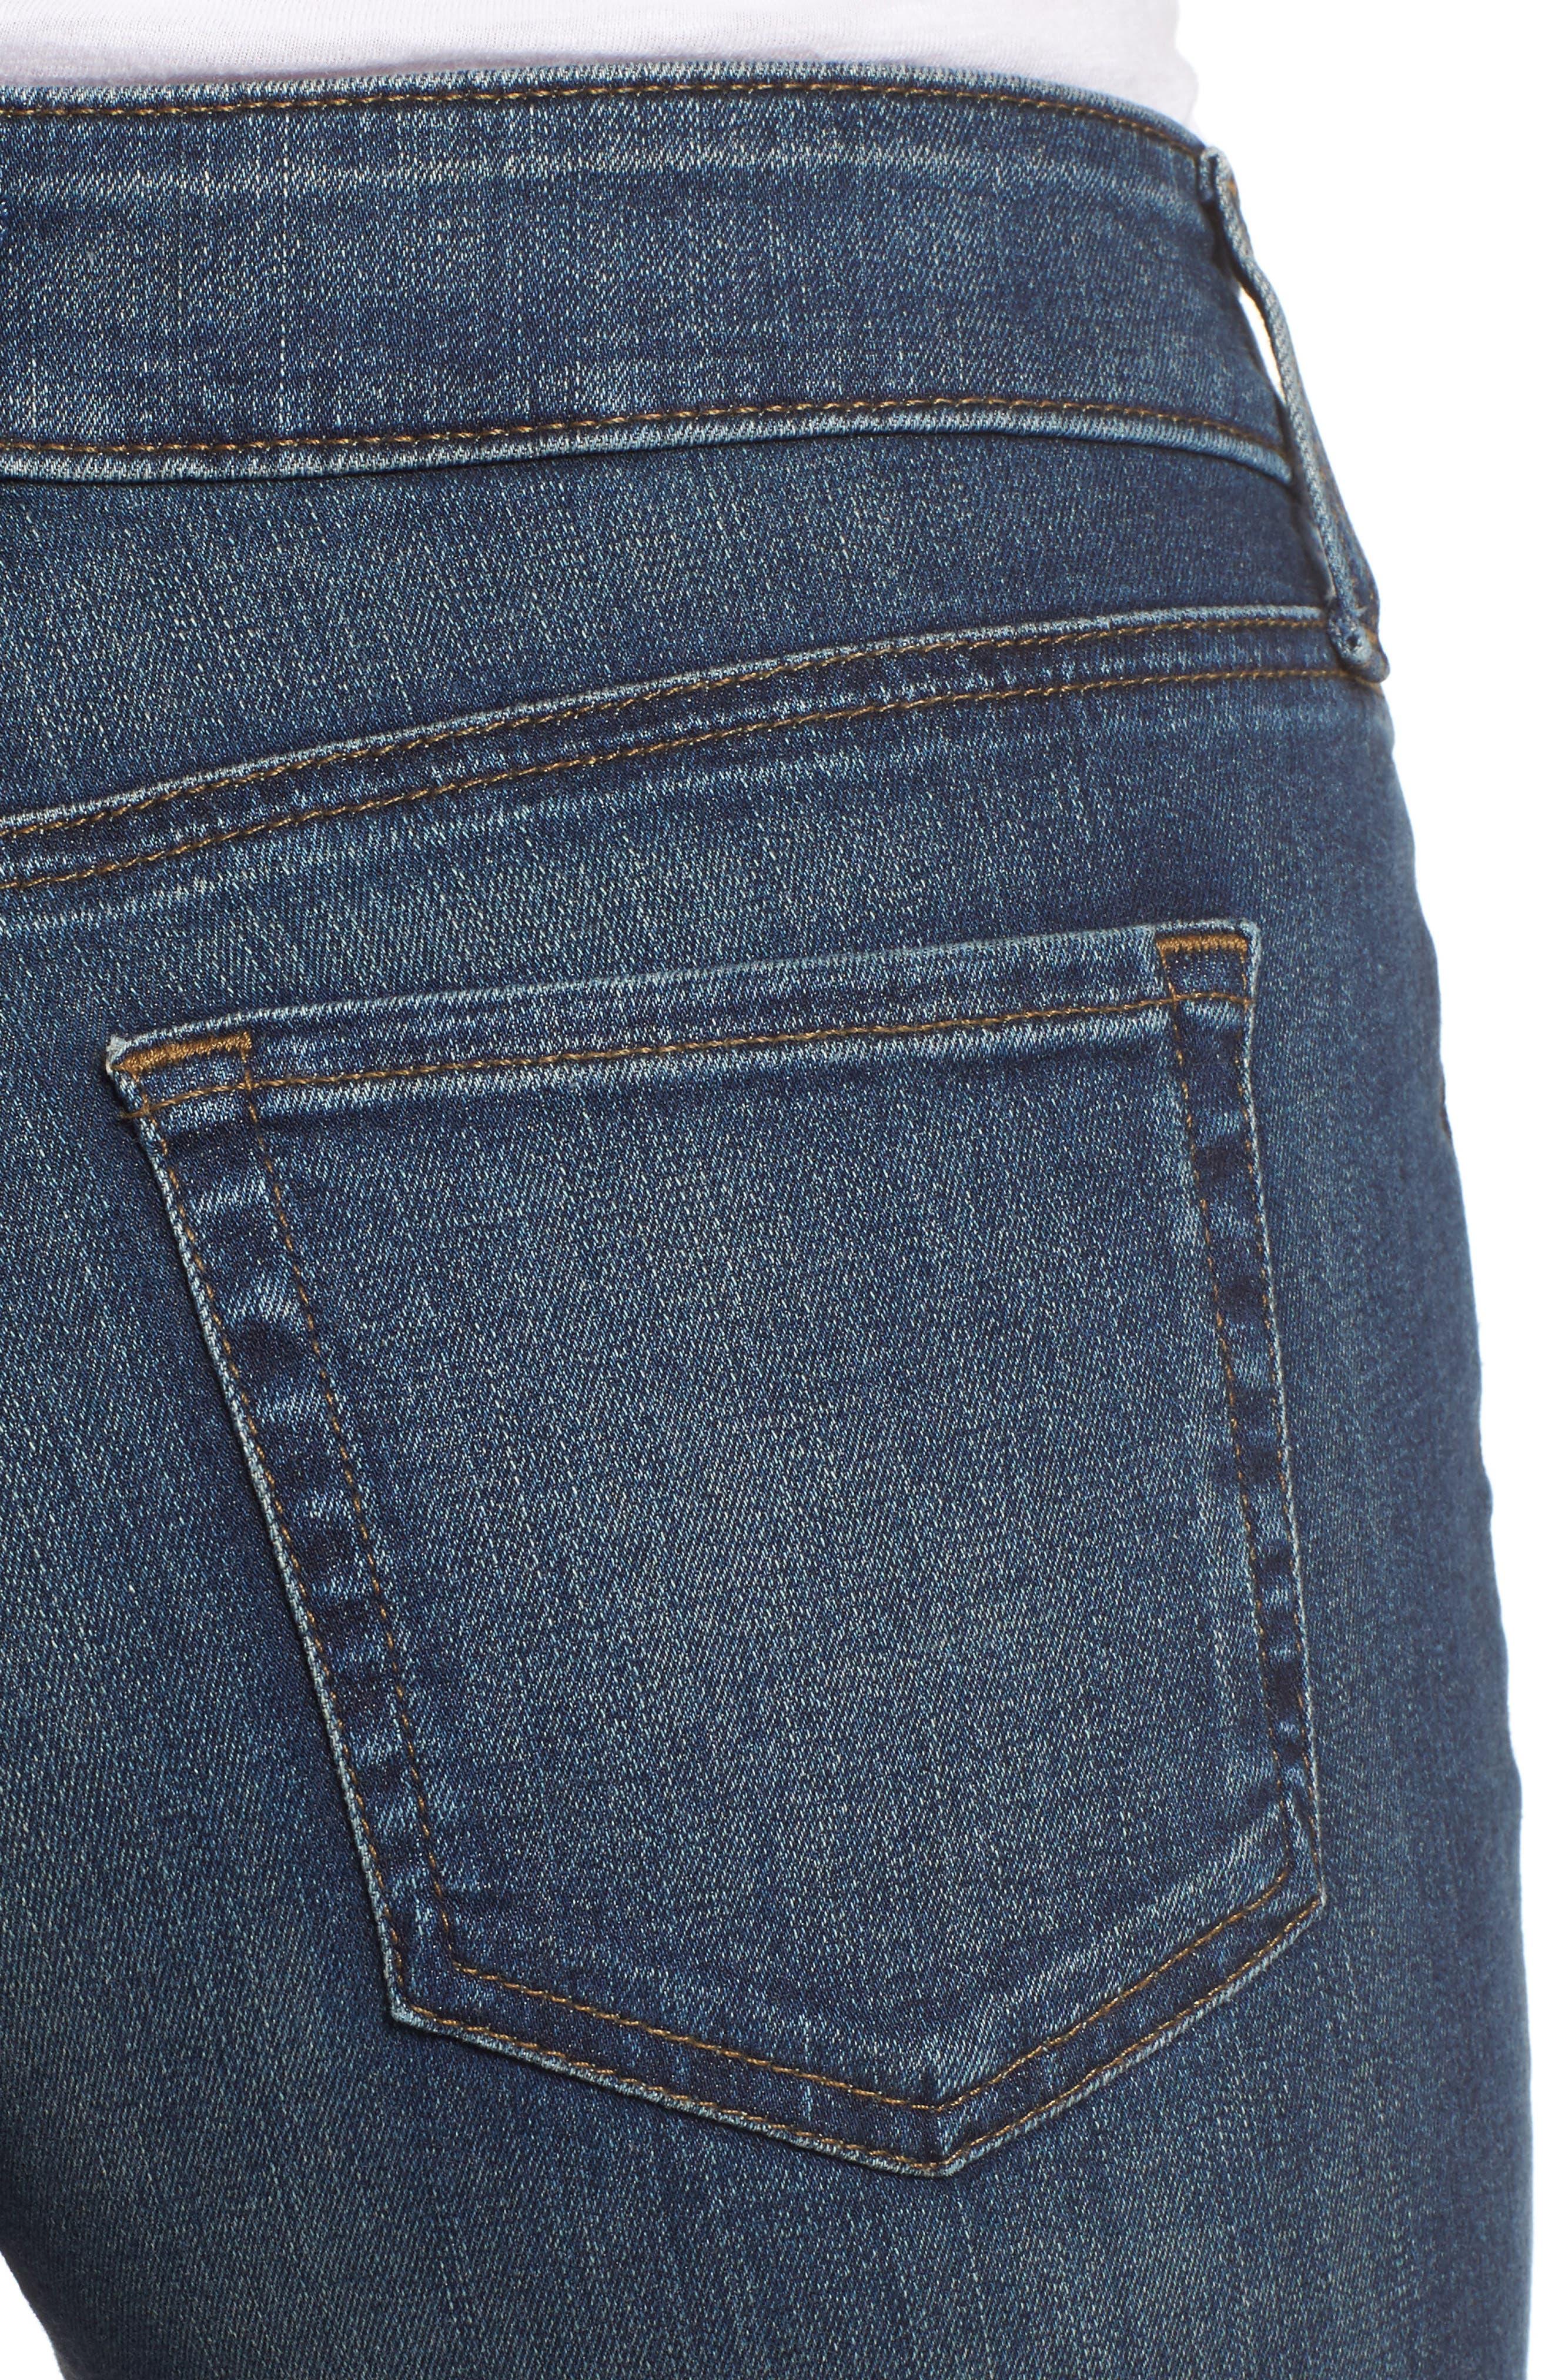 Alternate Image 4  - NYDJ Stretch Boyfriend Jeans (Regular & Petite)